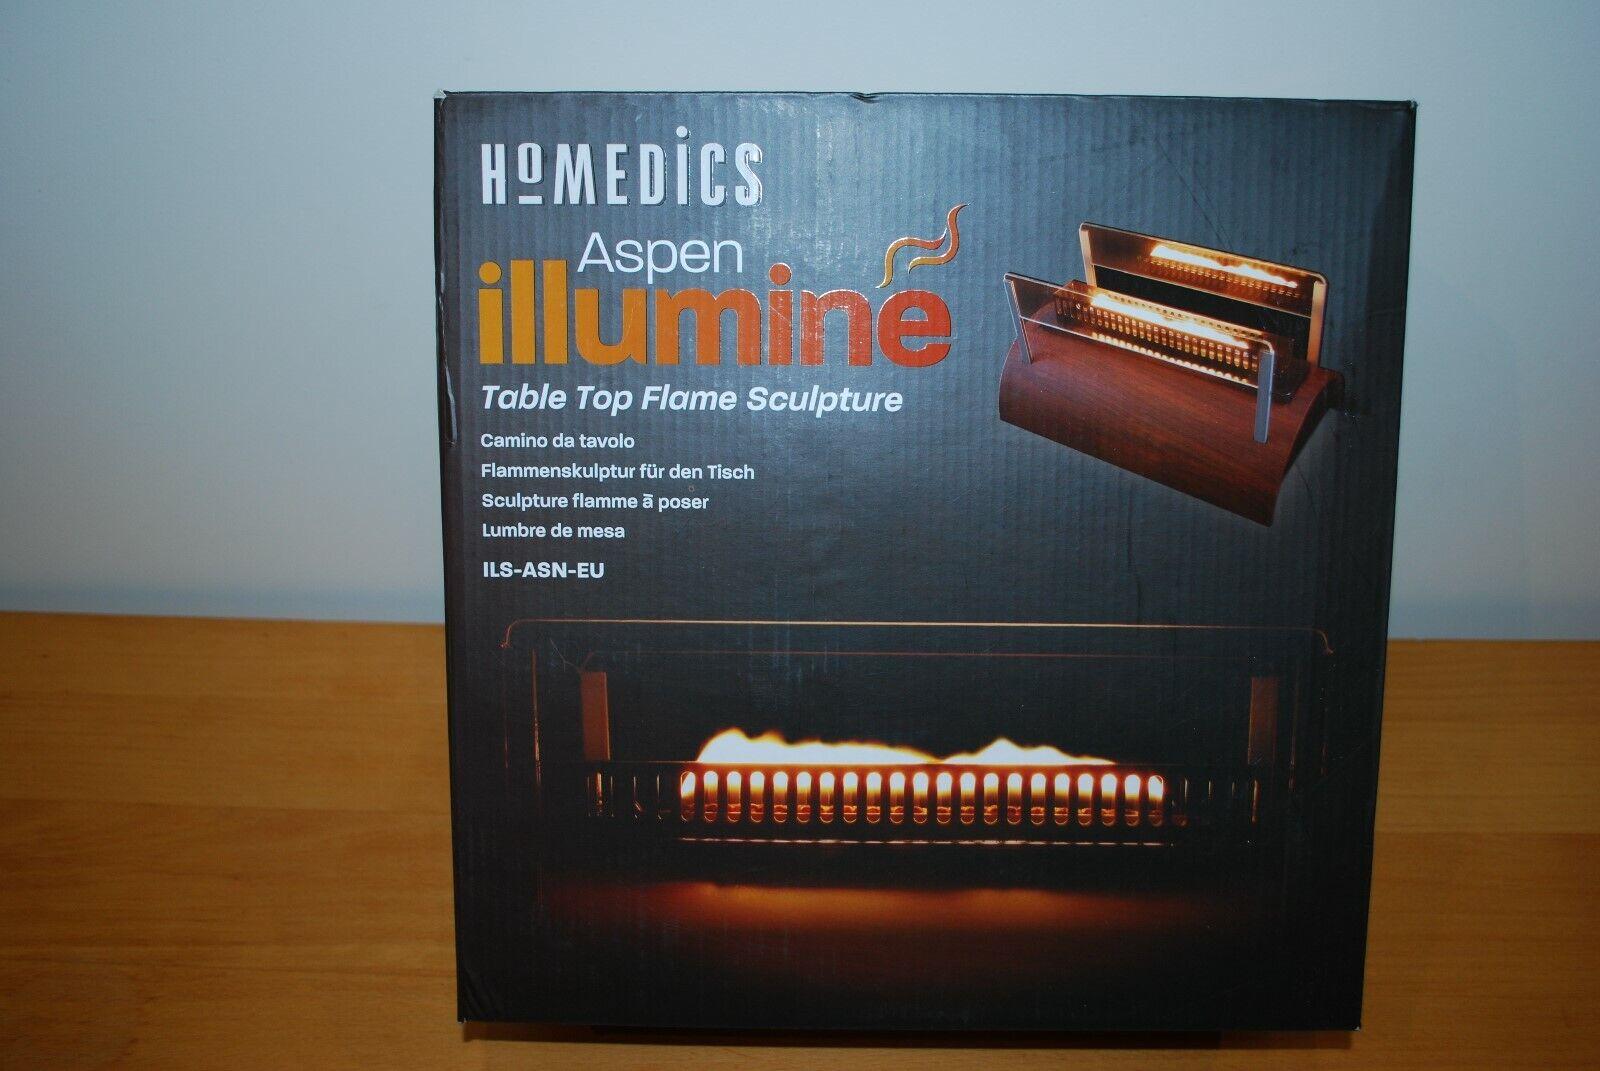 Homedics Aspen Illumine table top flame sculpture decorative - new in box